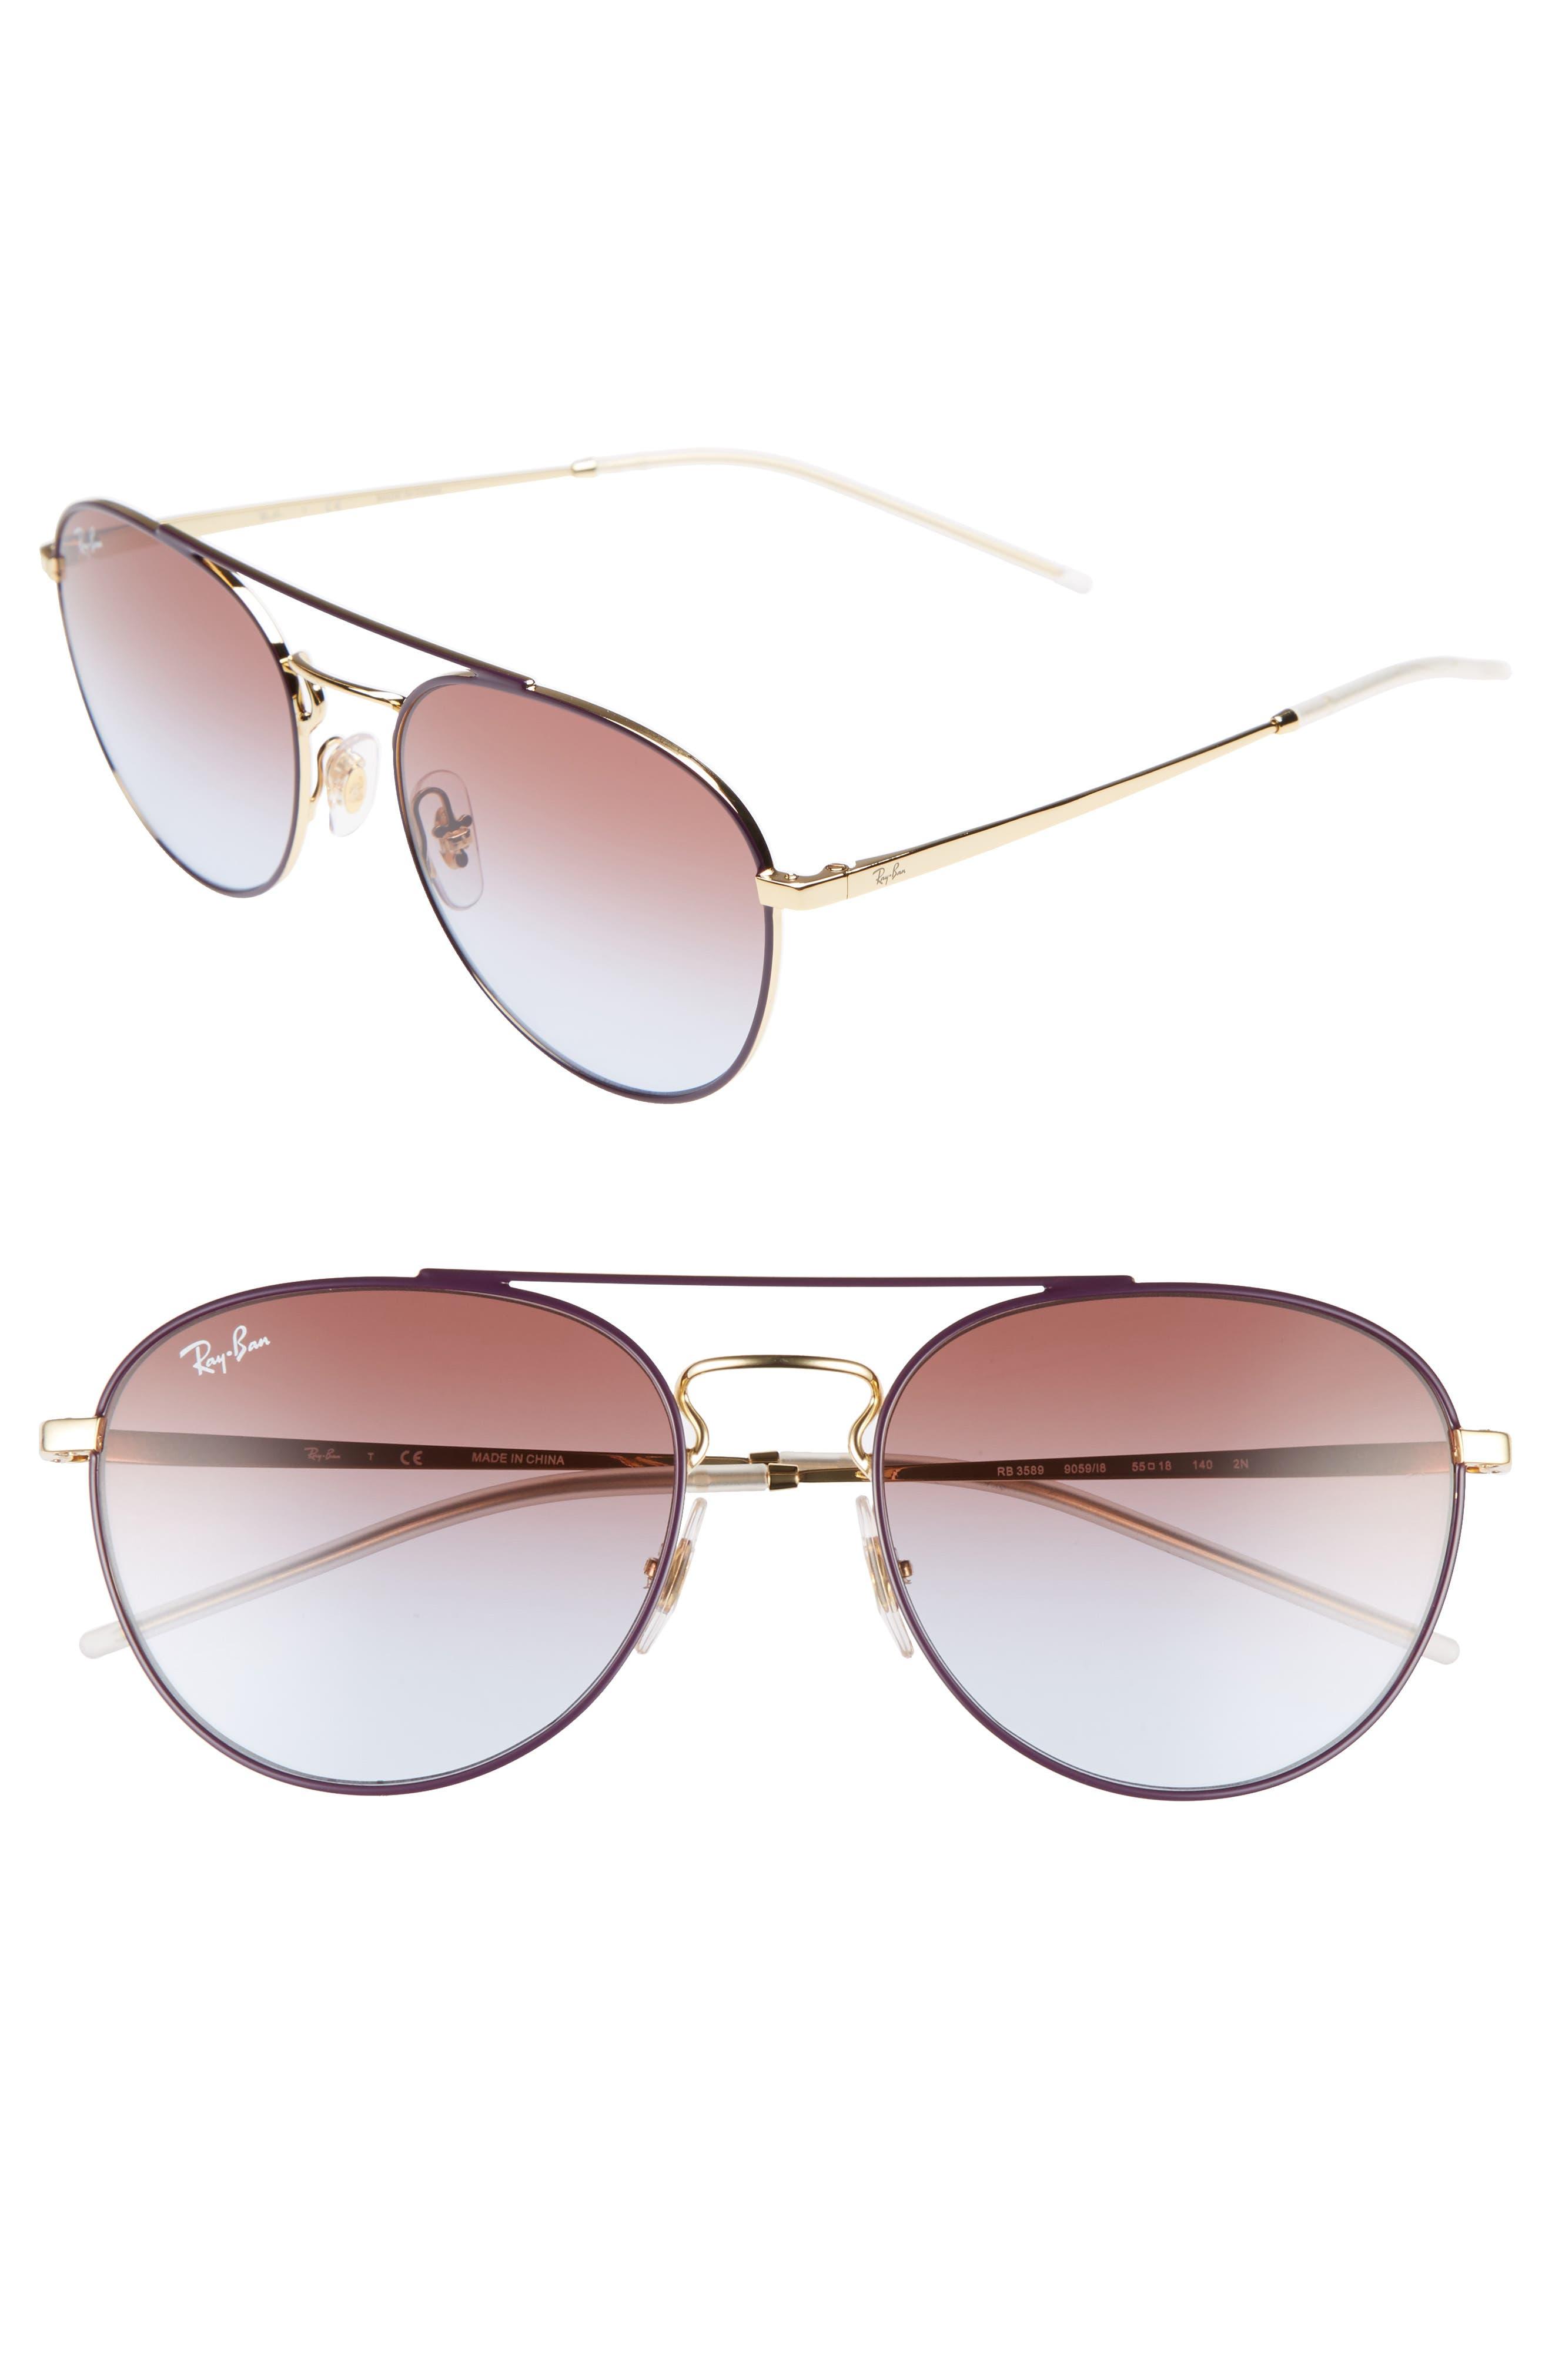 Alternate Image 1 Selected - Ray-Ban 55mm Gradient Lens Round Aviator Sunglasses